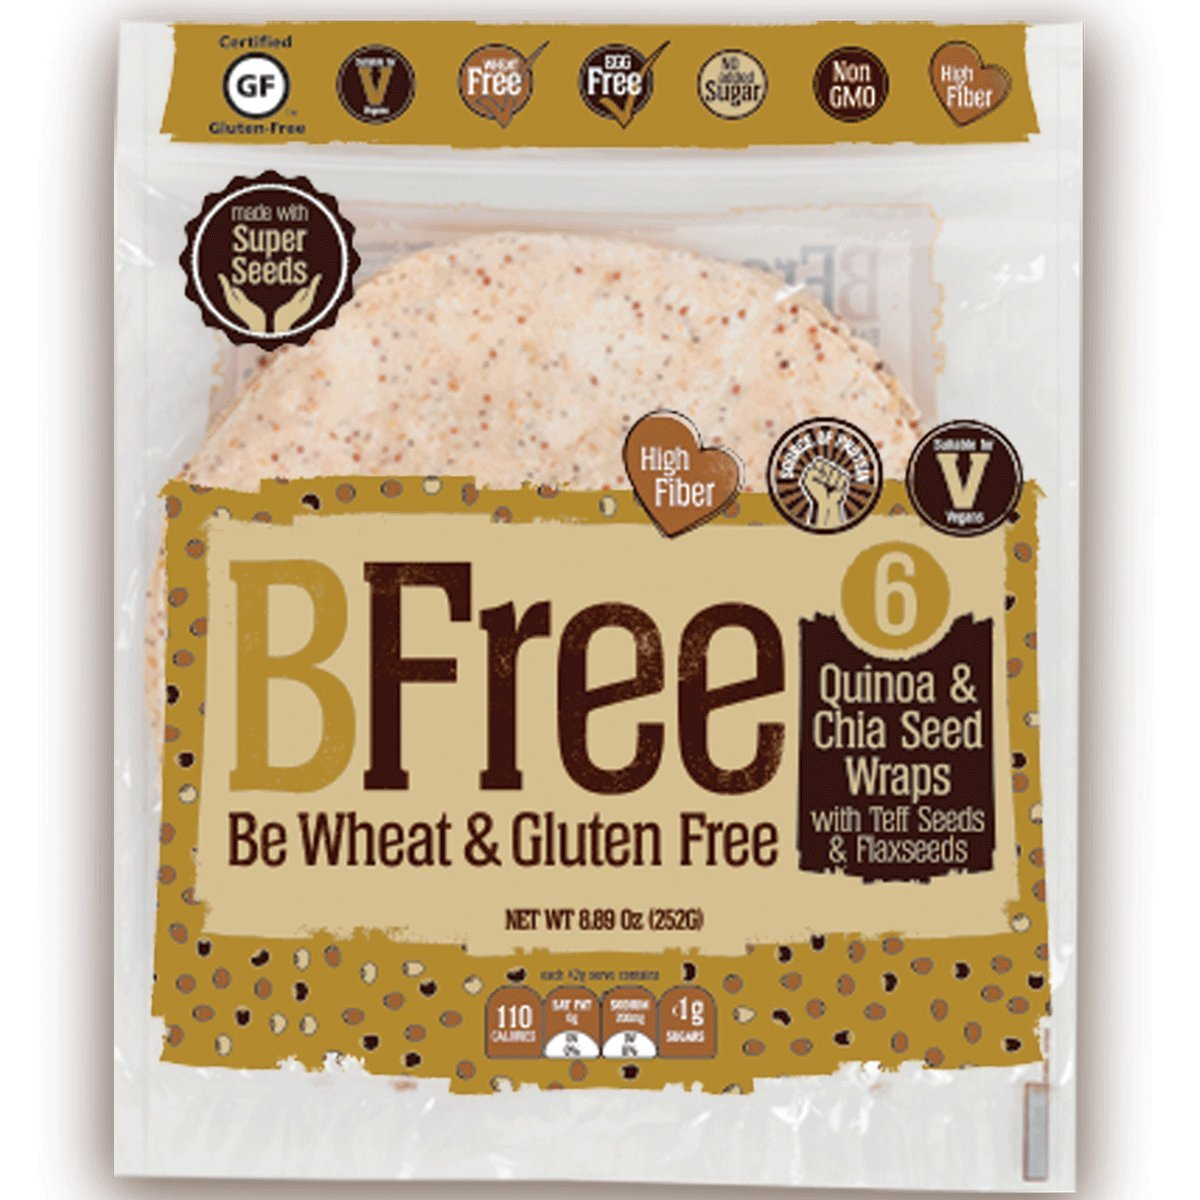 Bfree Gluten Free Tortilla Wrap 8